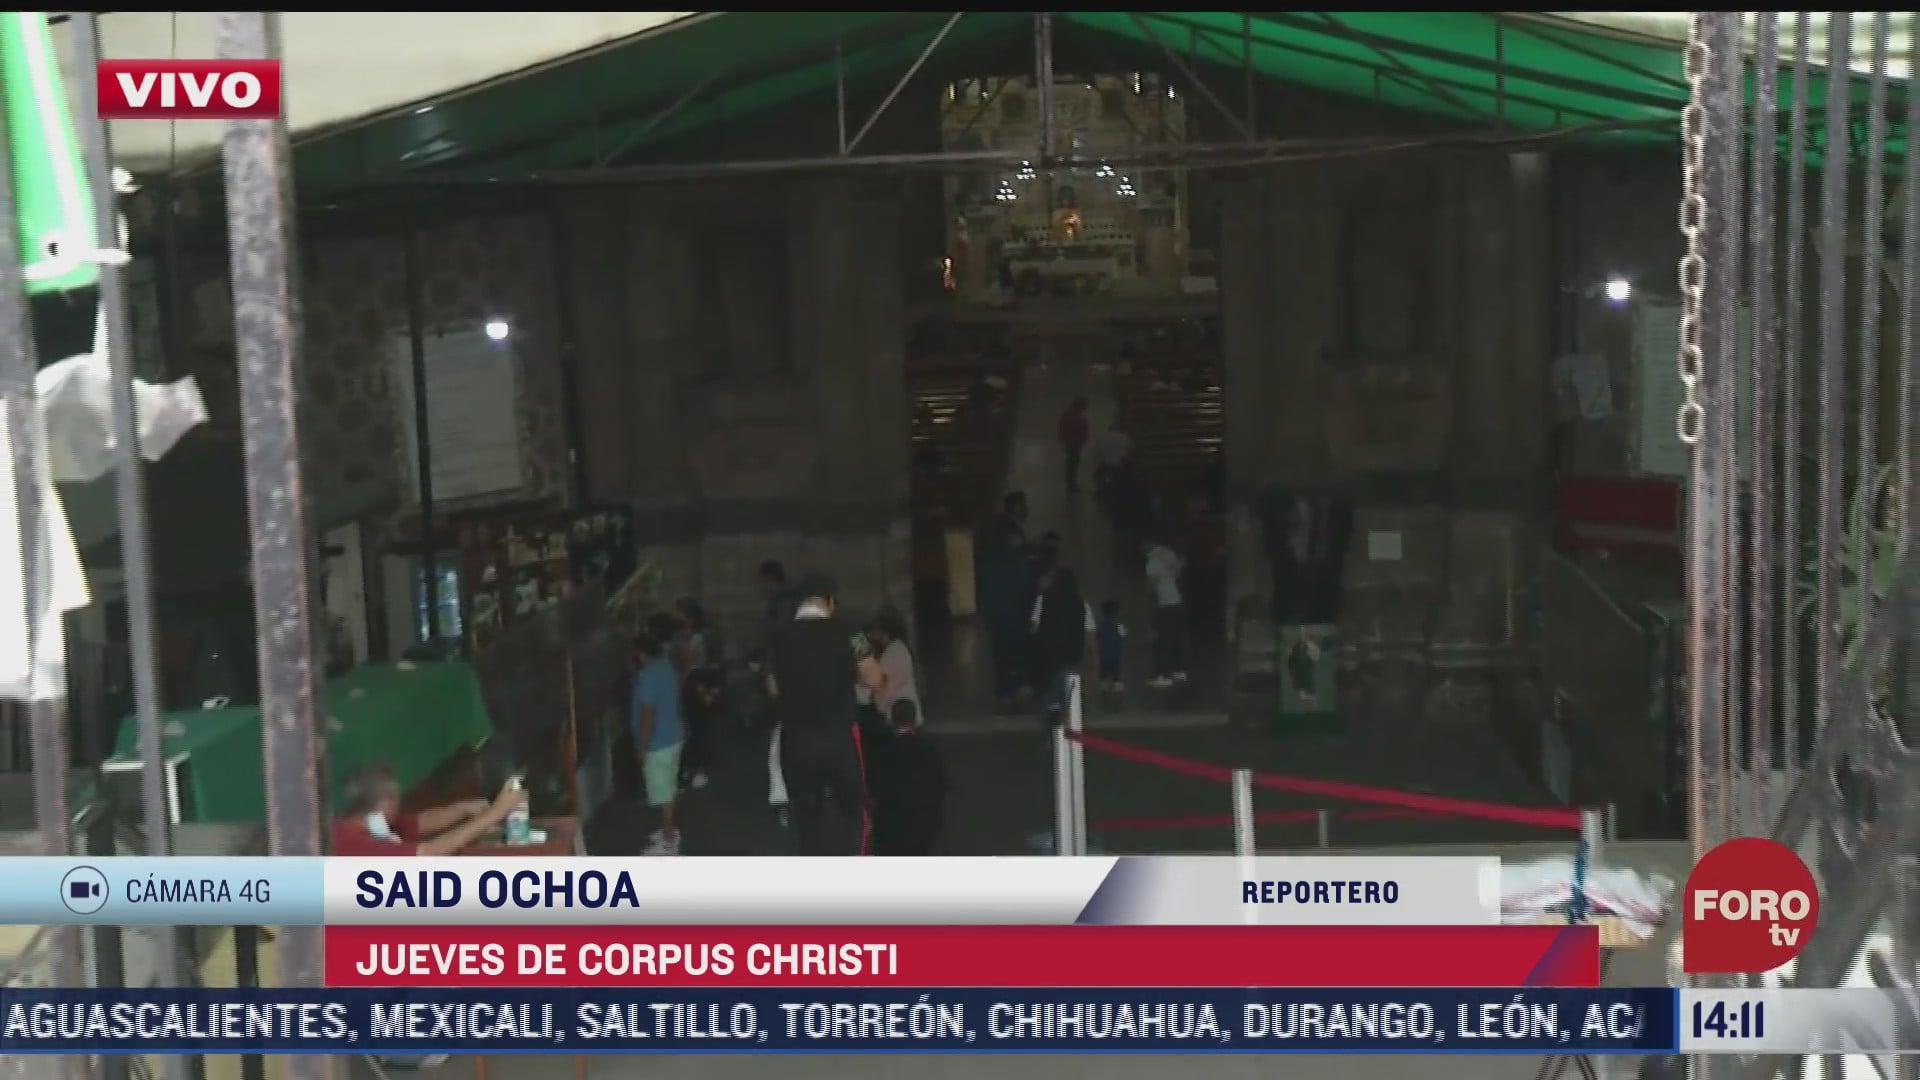 iglesia catolica celebra jueves de corpus christi